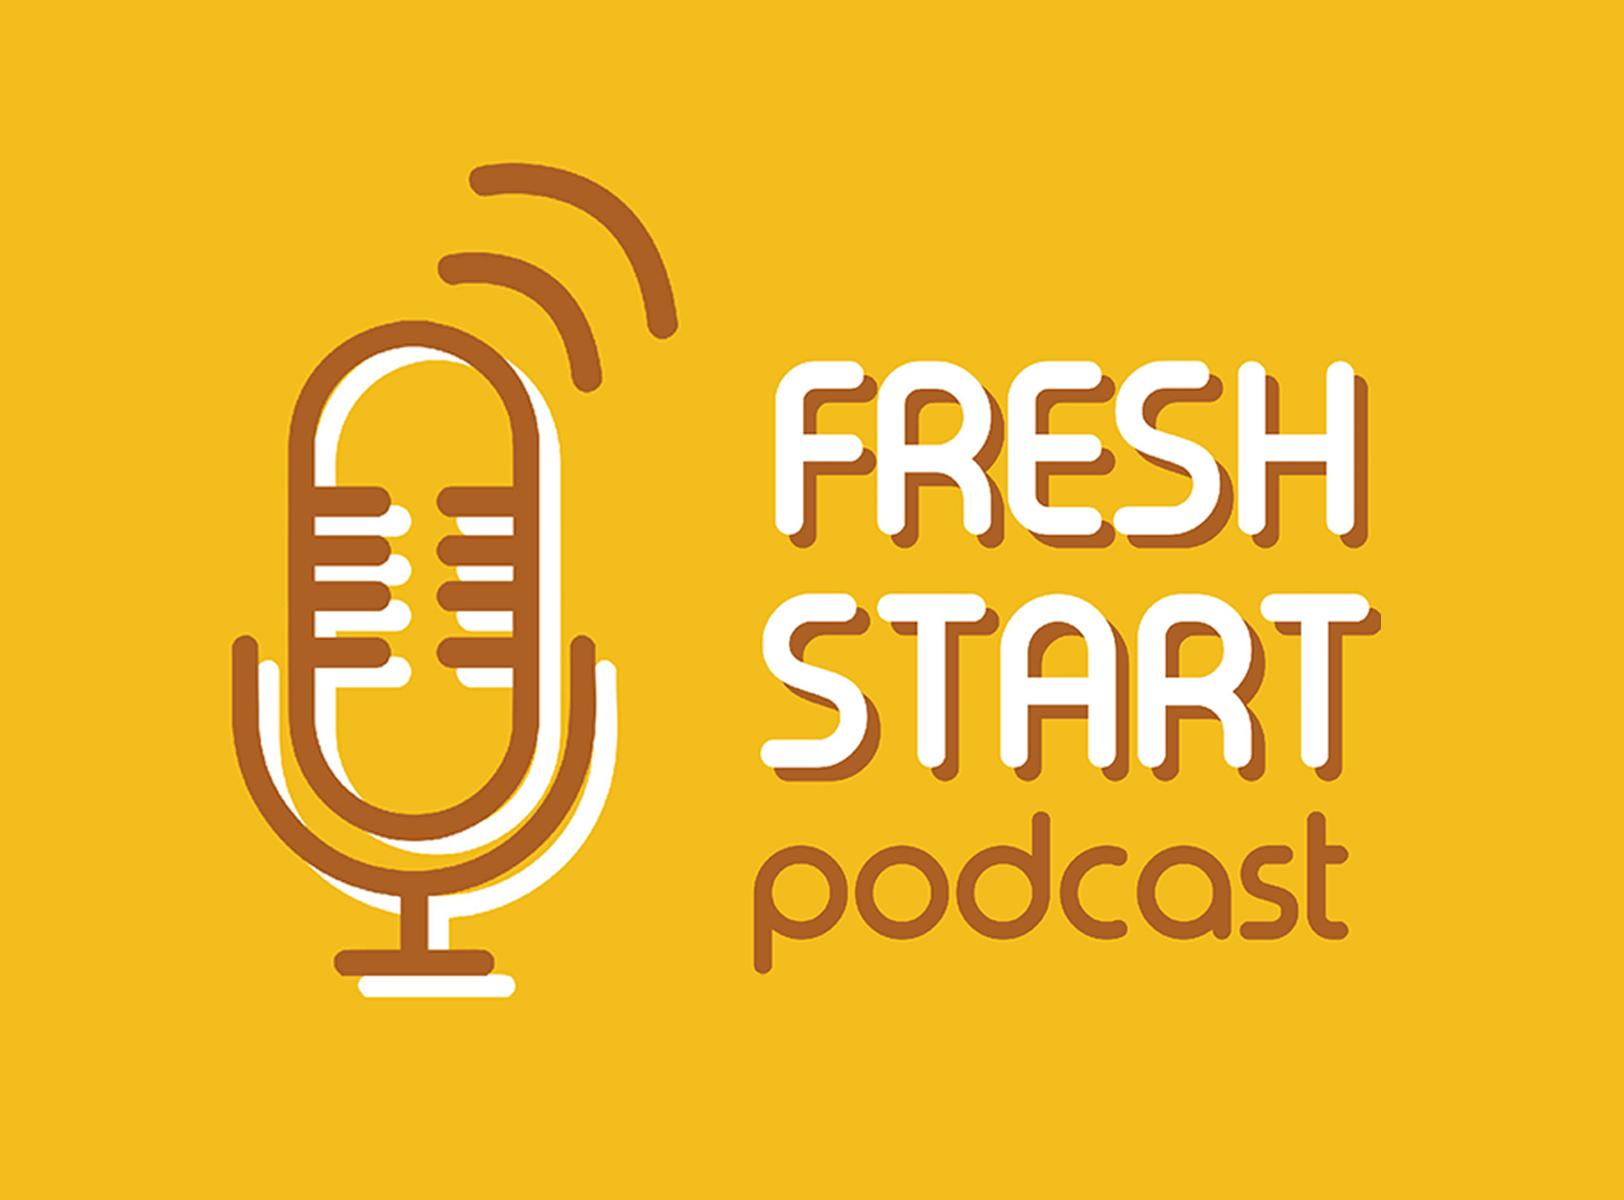 Fresh Start: Podcast News (9/29/2019 Sun.)